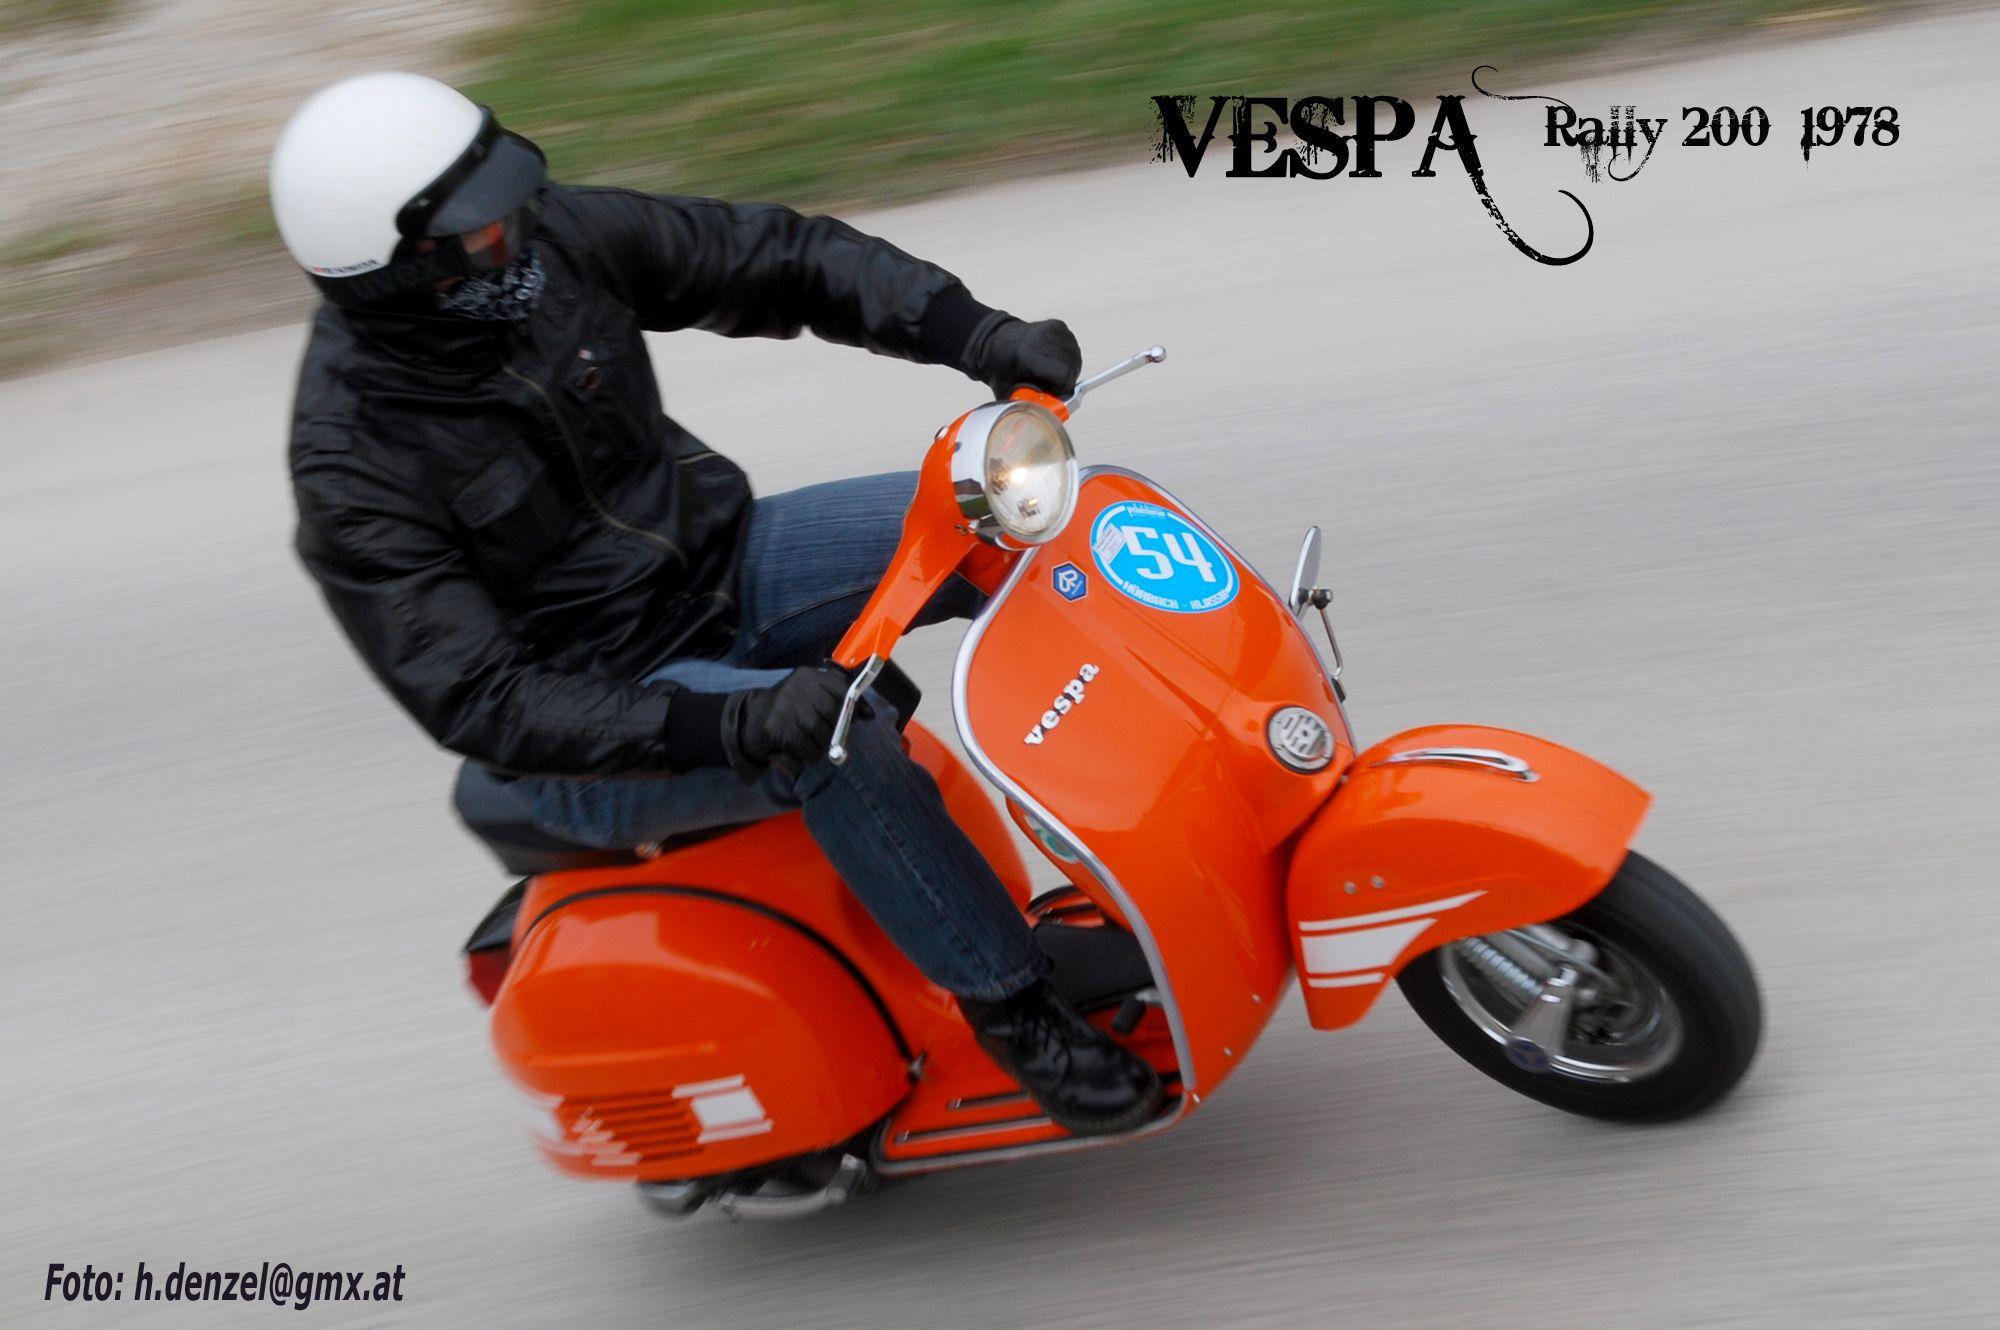 Vespa Rally 200 1978